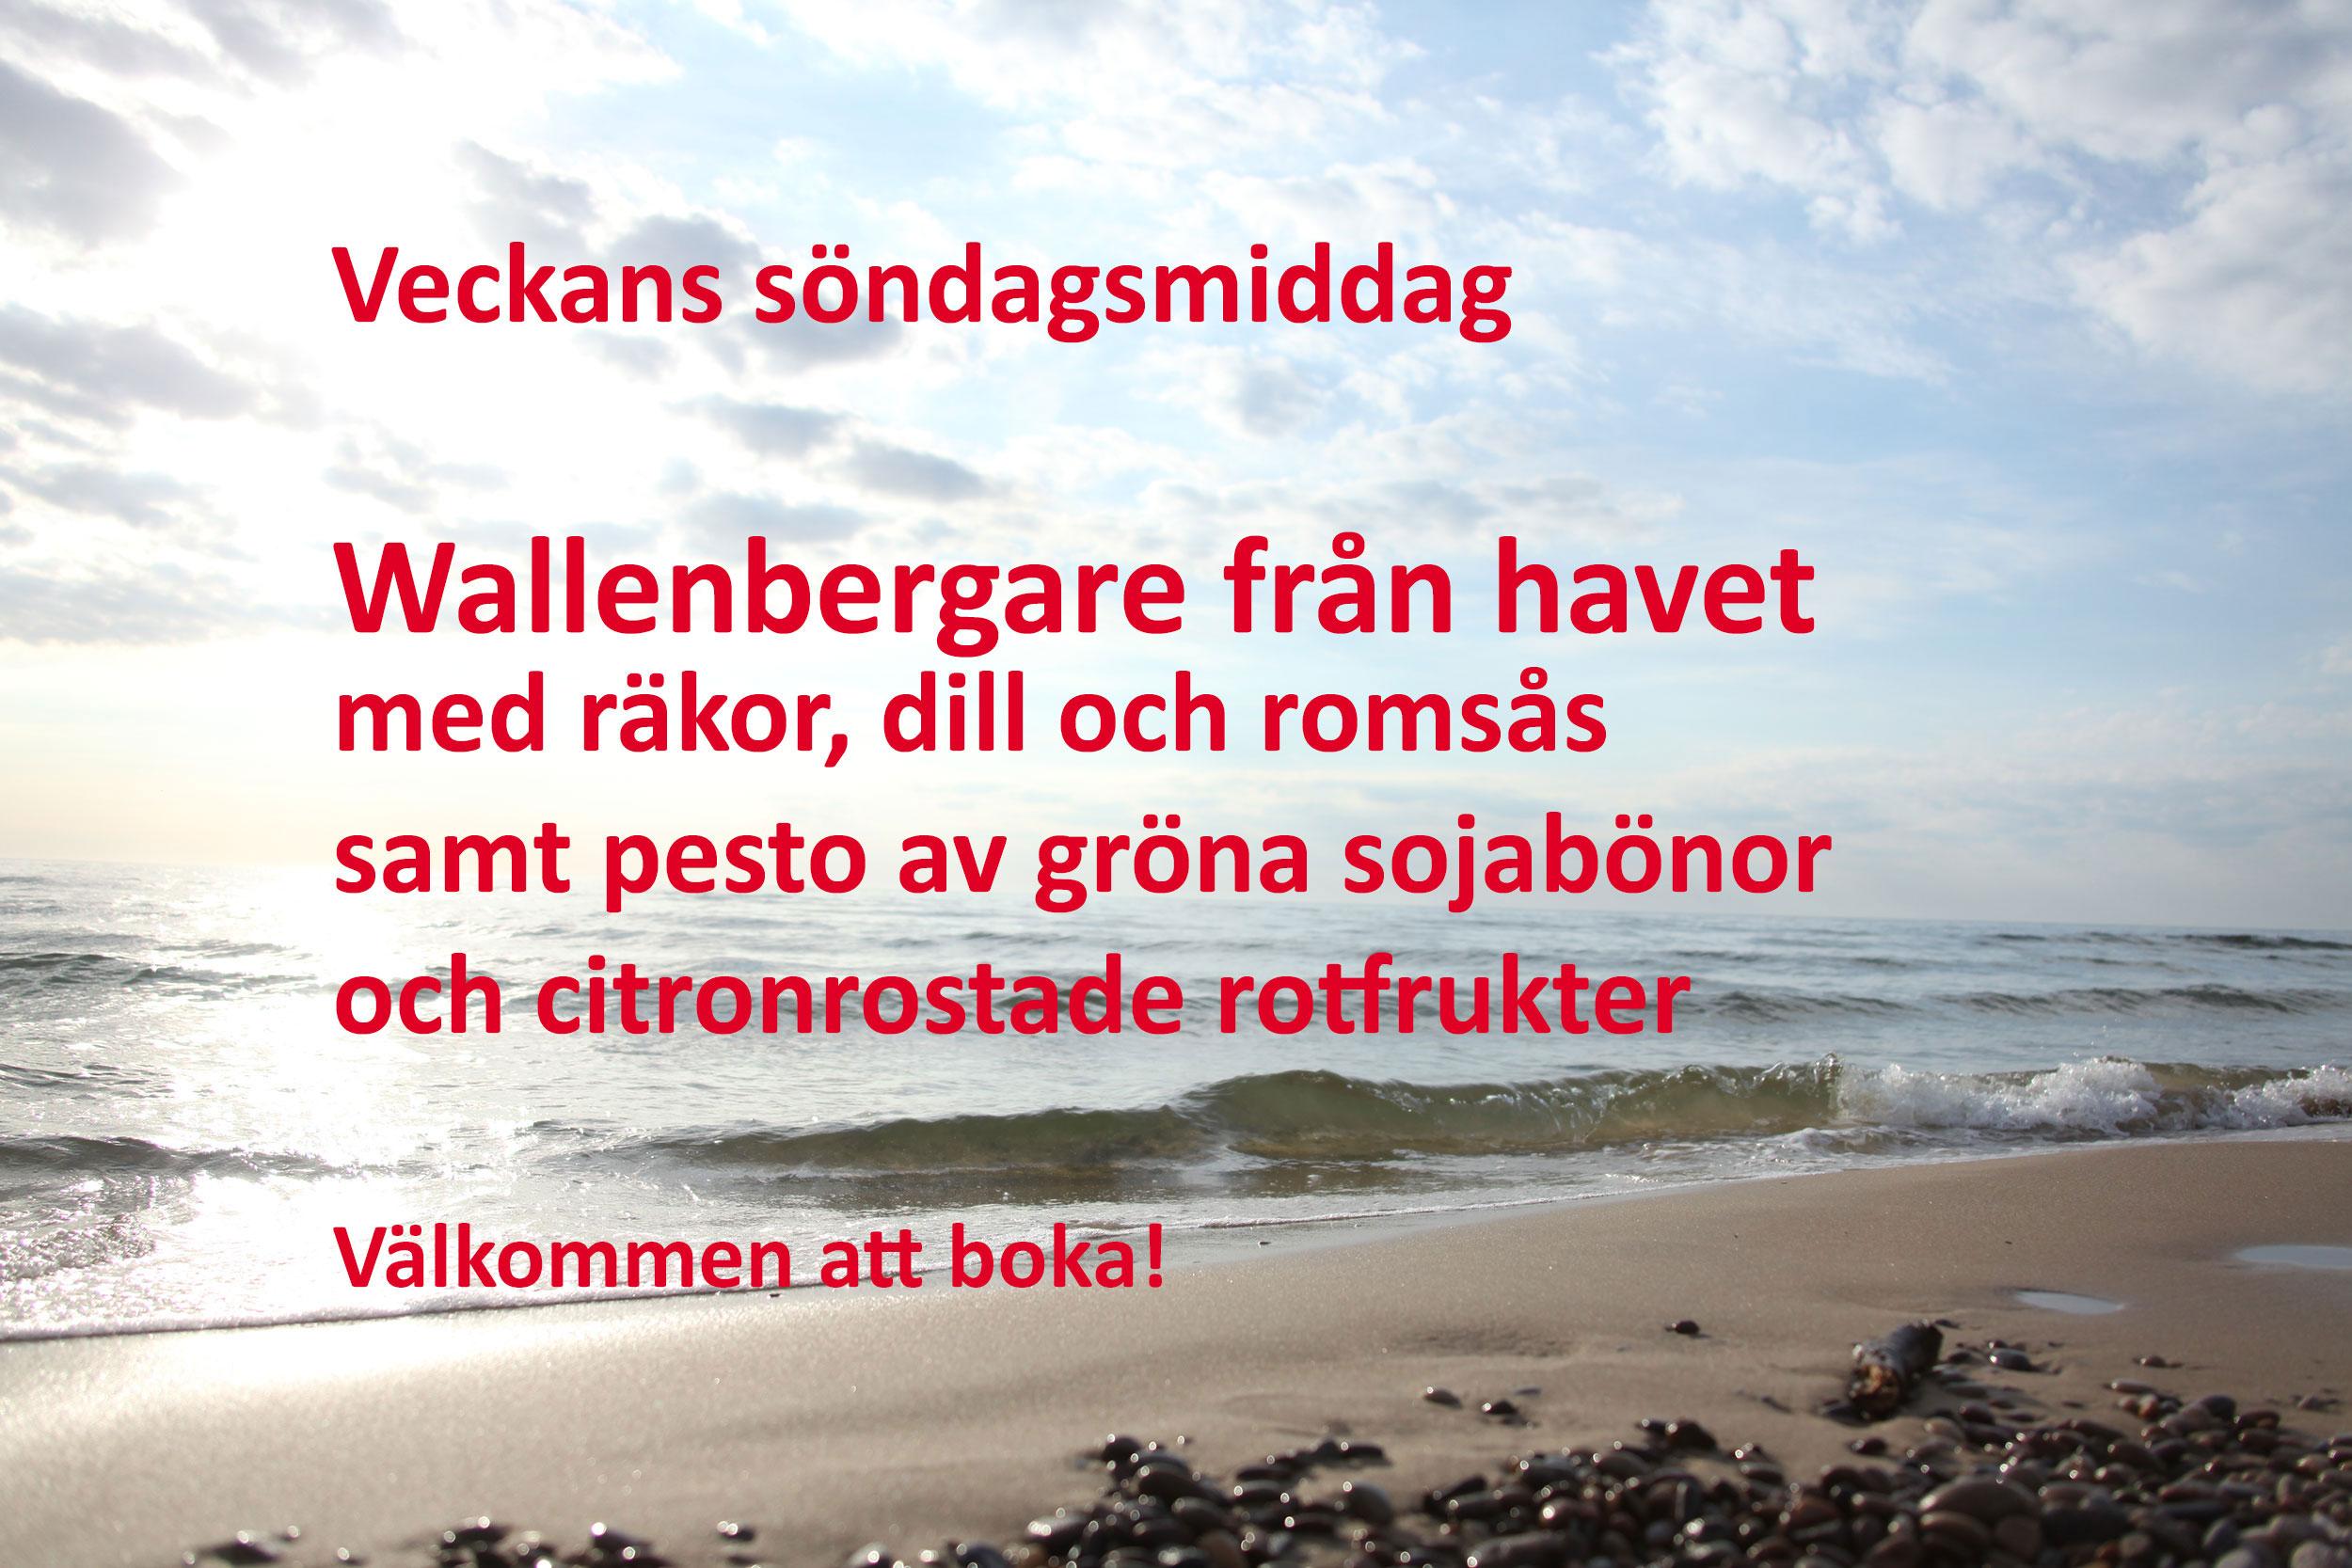 IMG 8662HAVET 1m Wallenbeg